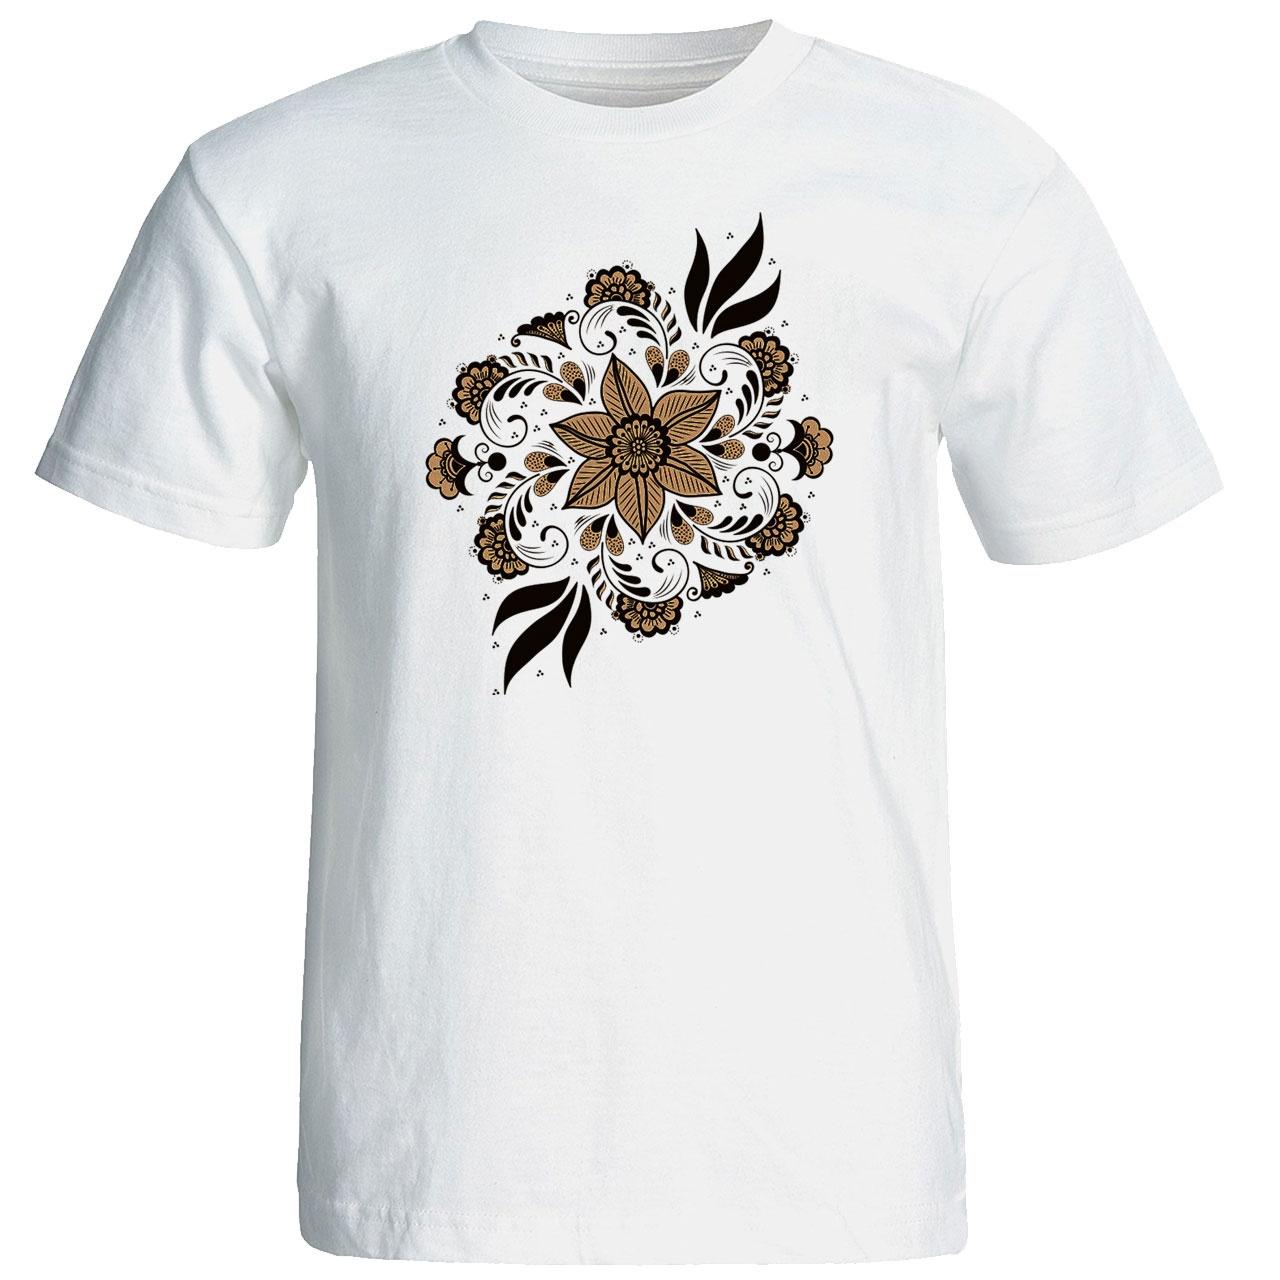 تی شرت زنانه الی شاپ طرح 12620